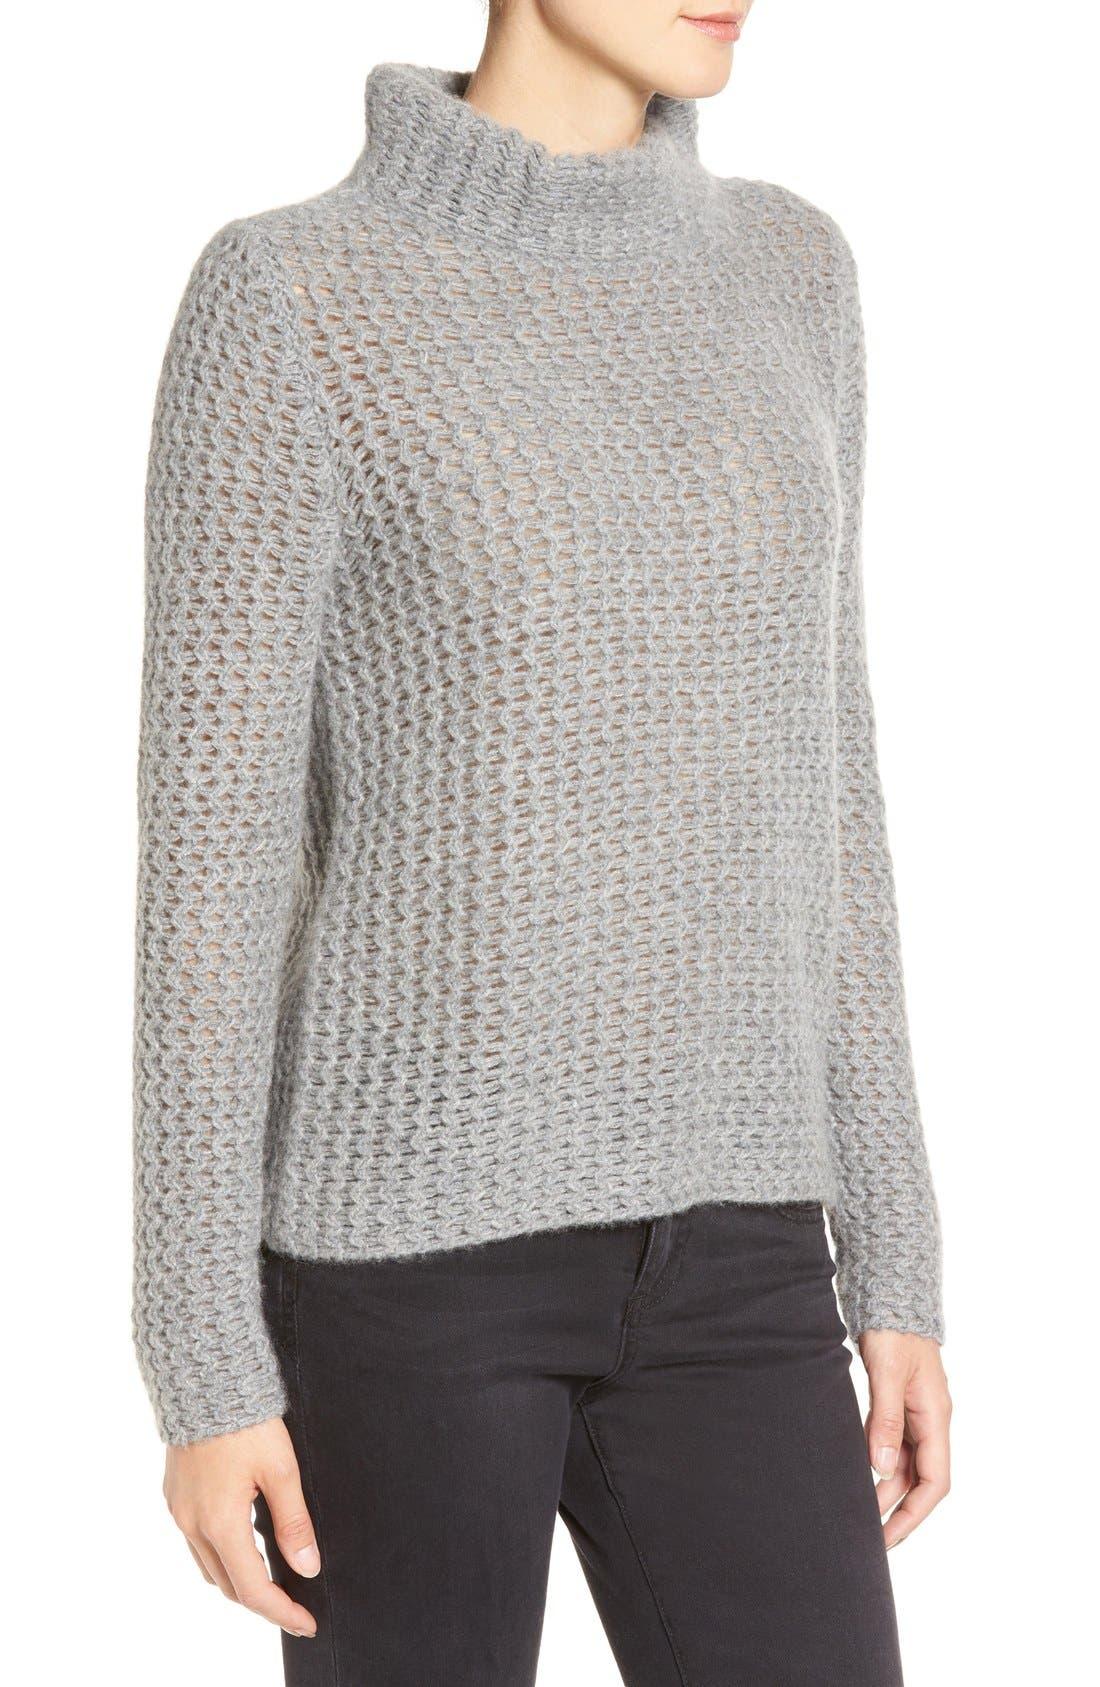 Stitch Detail Cashmere Mock Neck Sweater,                             Alternate thumbnail 2, color,                             030